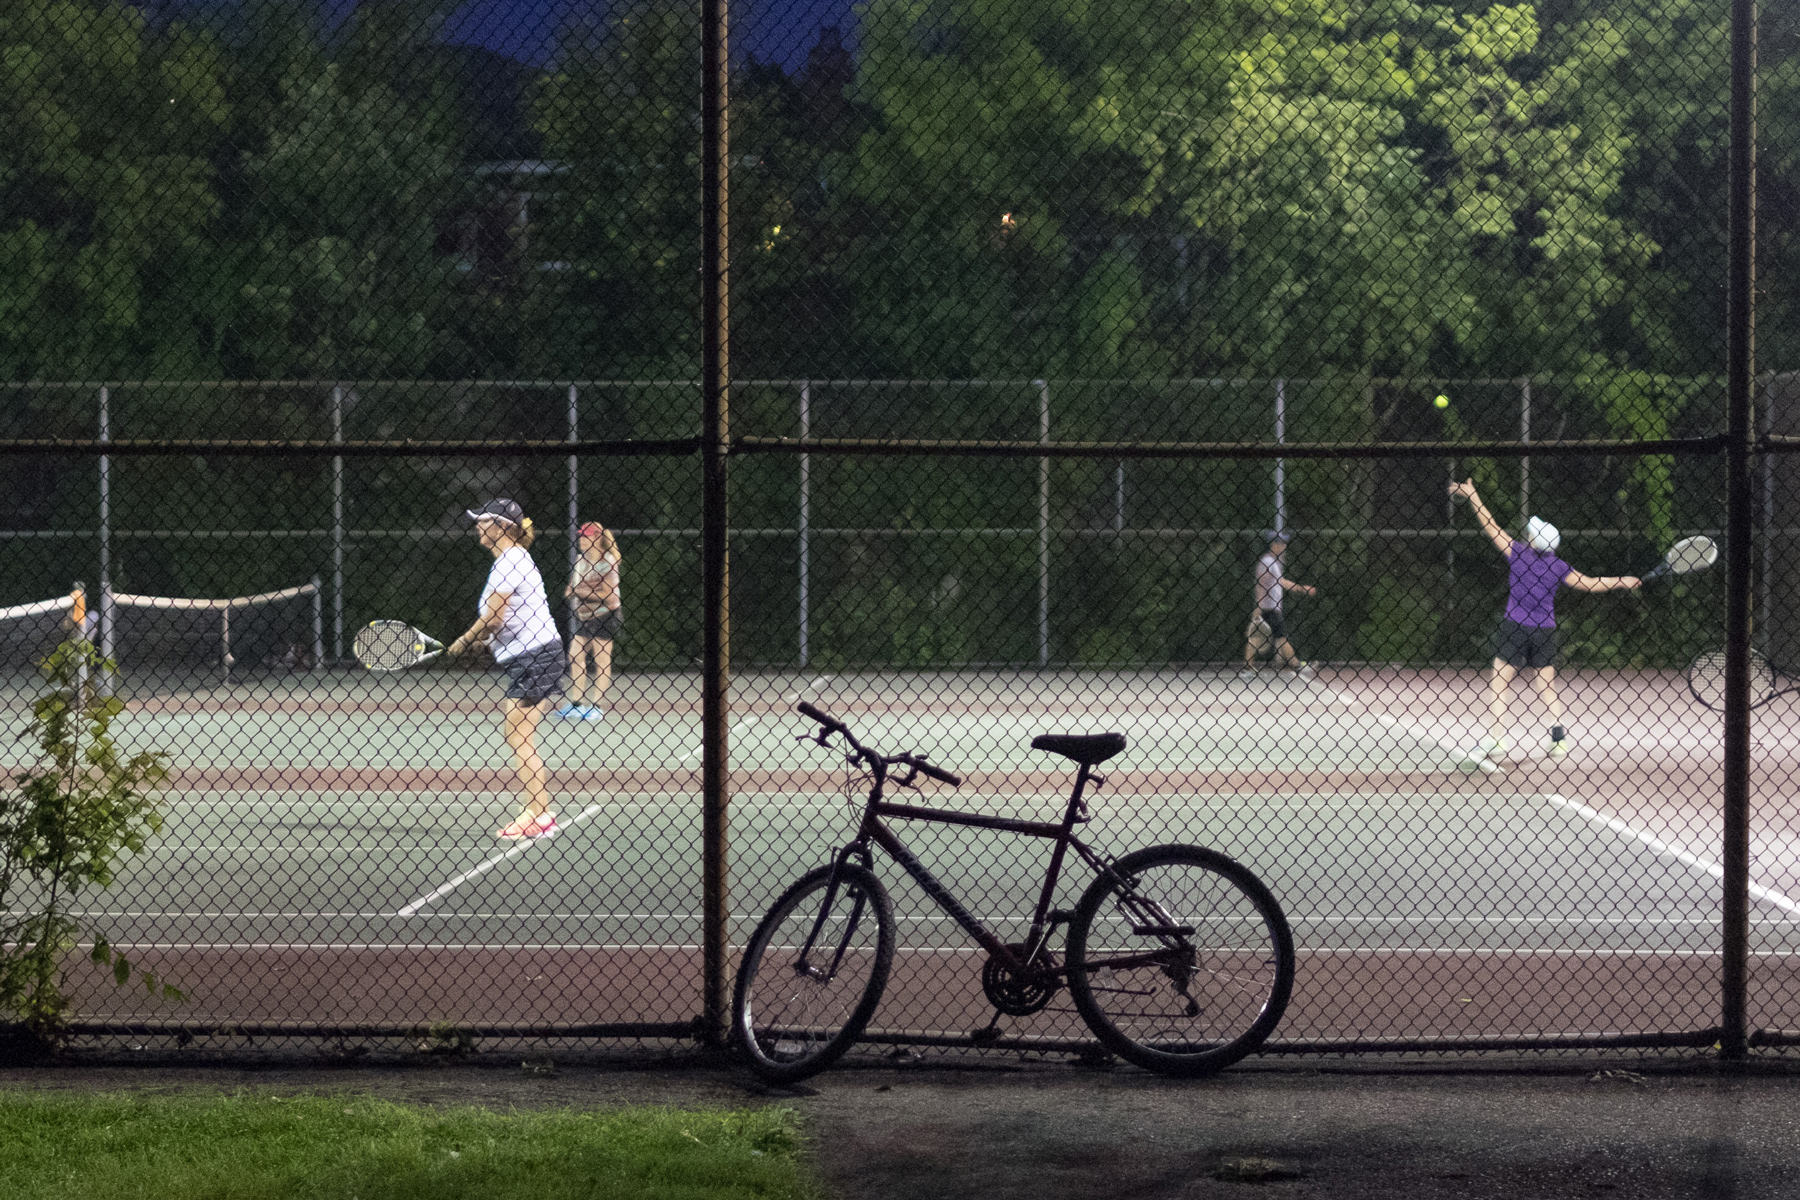 Le vélo d'un sportif, parc Nicolas-Viel, Ahuntsic